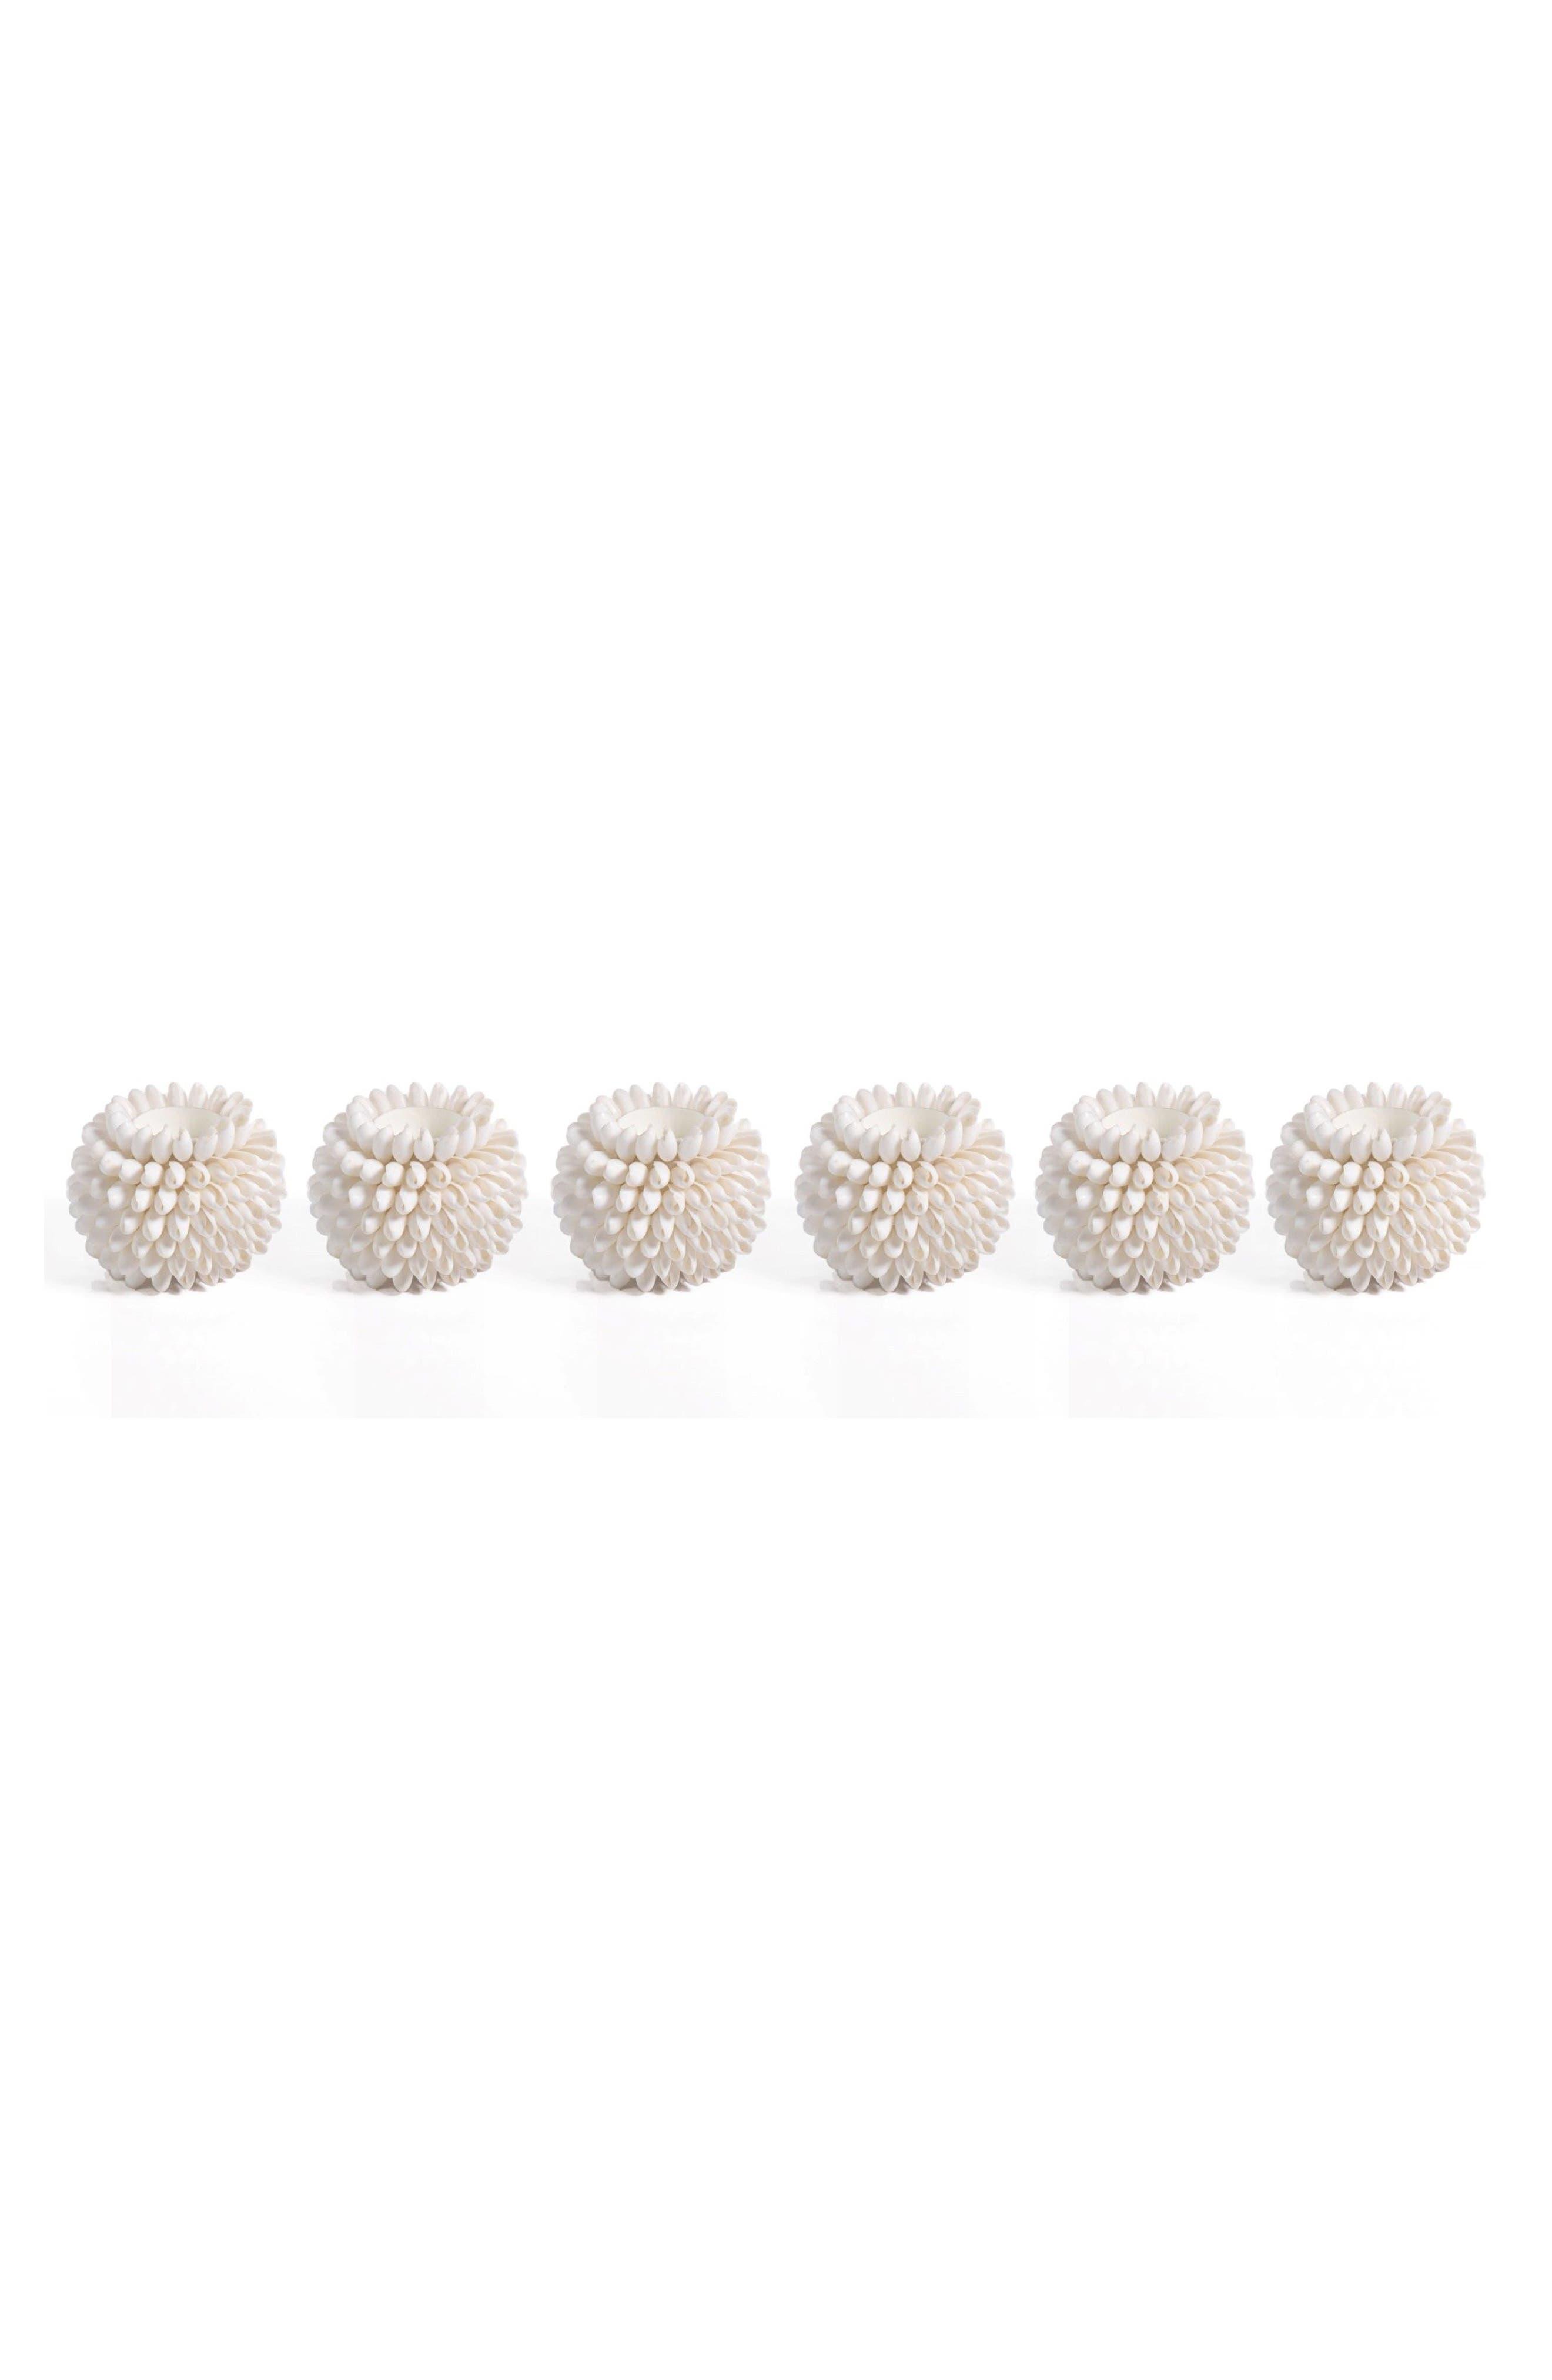 Main Image - Zodax Hydatina Physis Set of 6 Tealight Holders